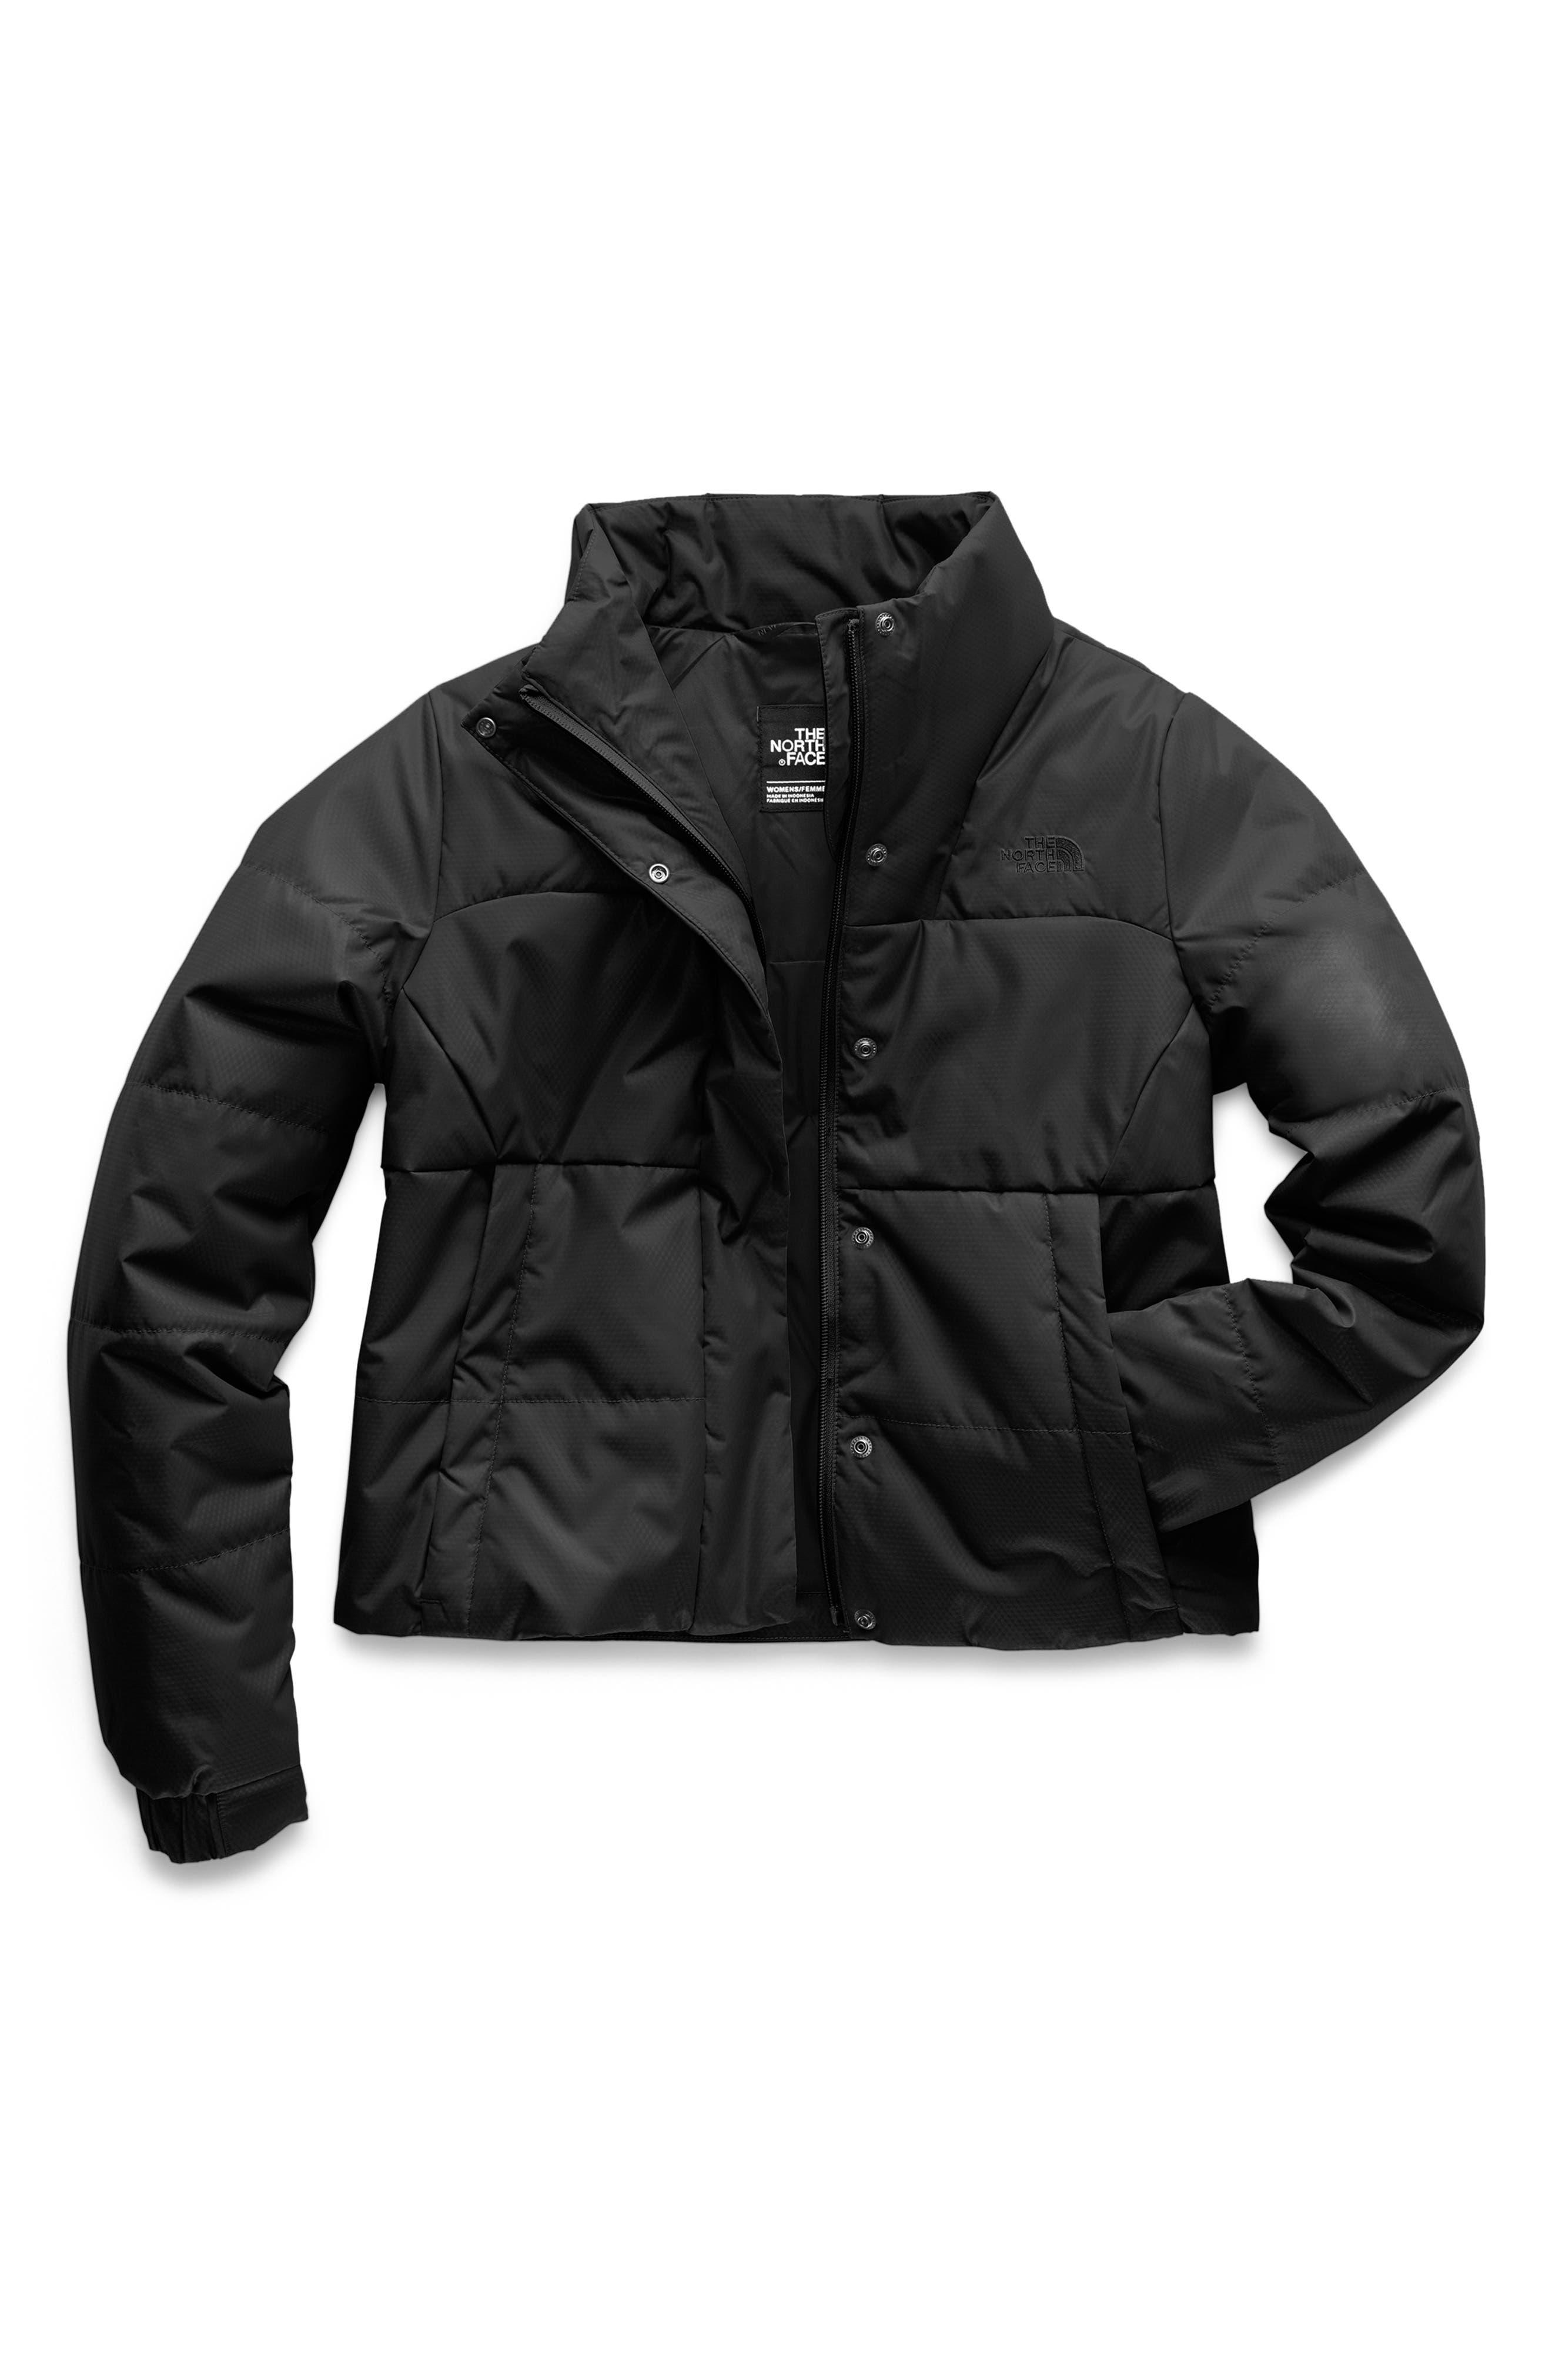 THE NORTH FACE, Femtastic Heatseeker Insulated Jacket, Alternate thumbnail 8, color, TNF BLACK